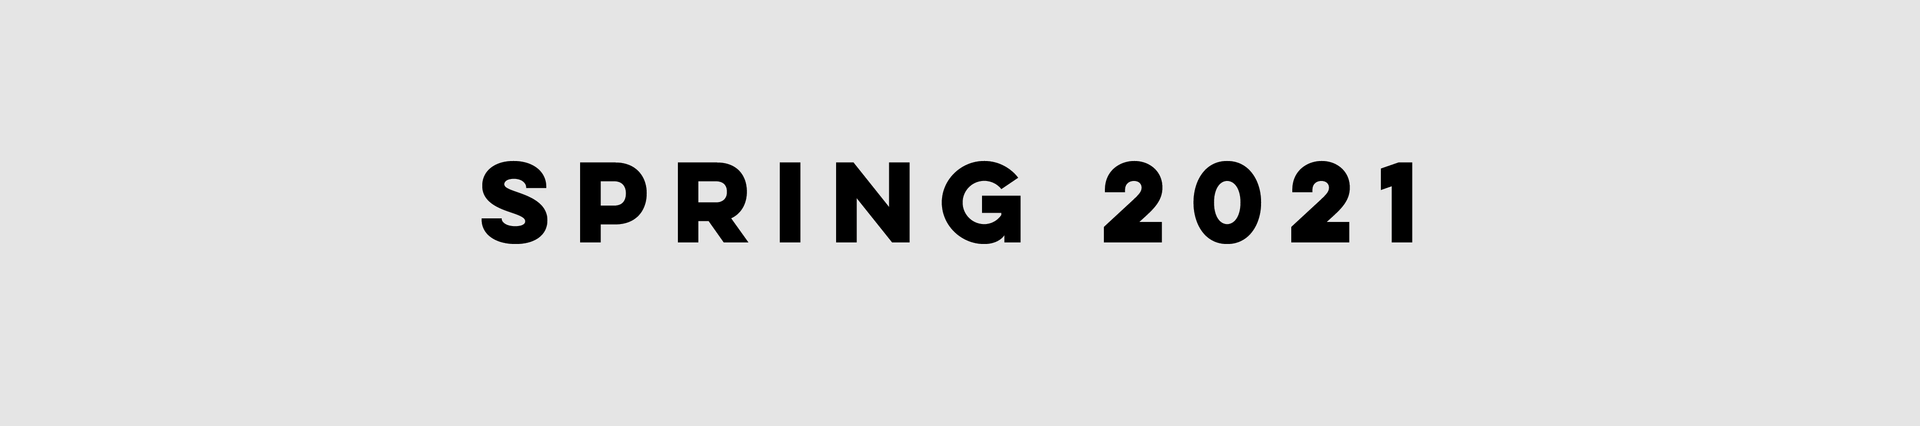 OGI Spring 2021